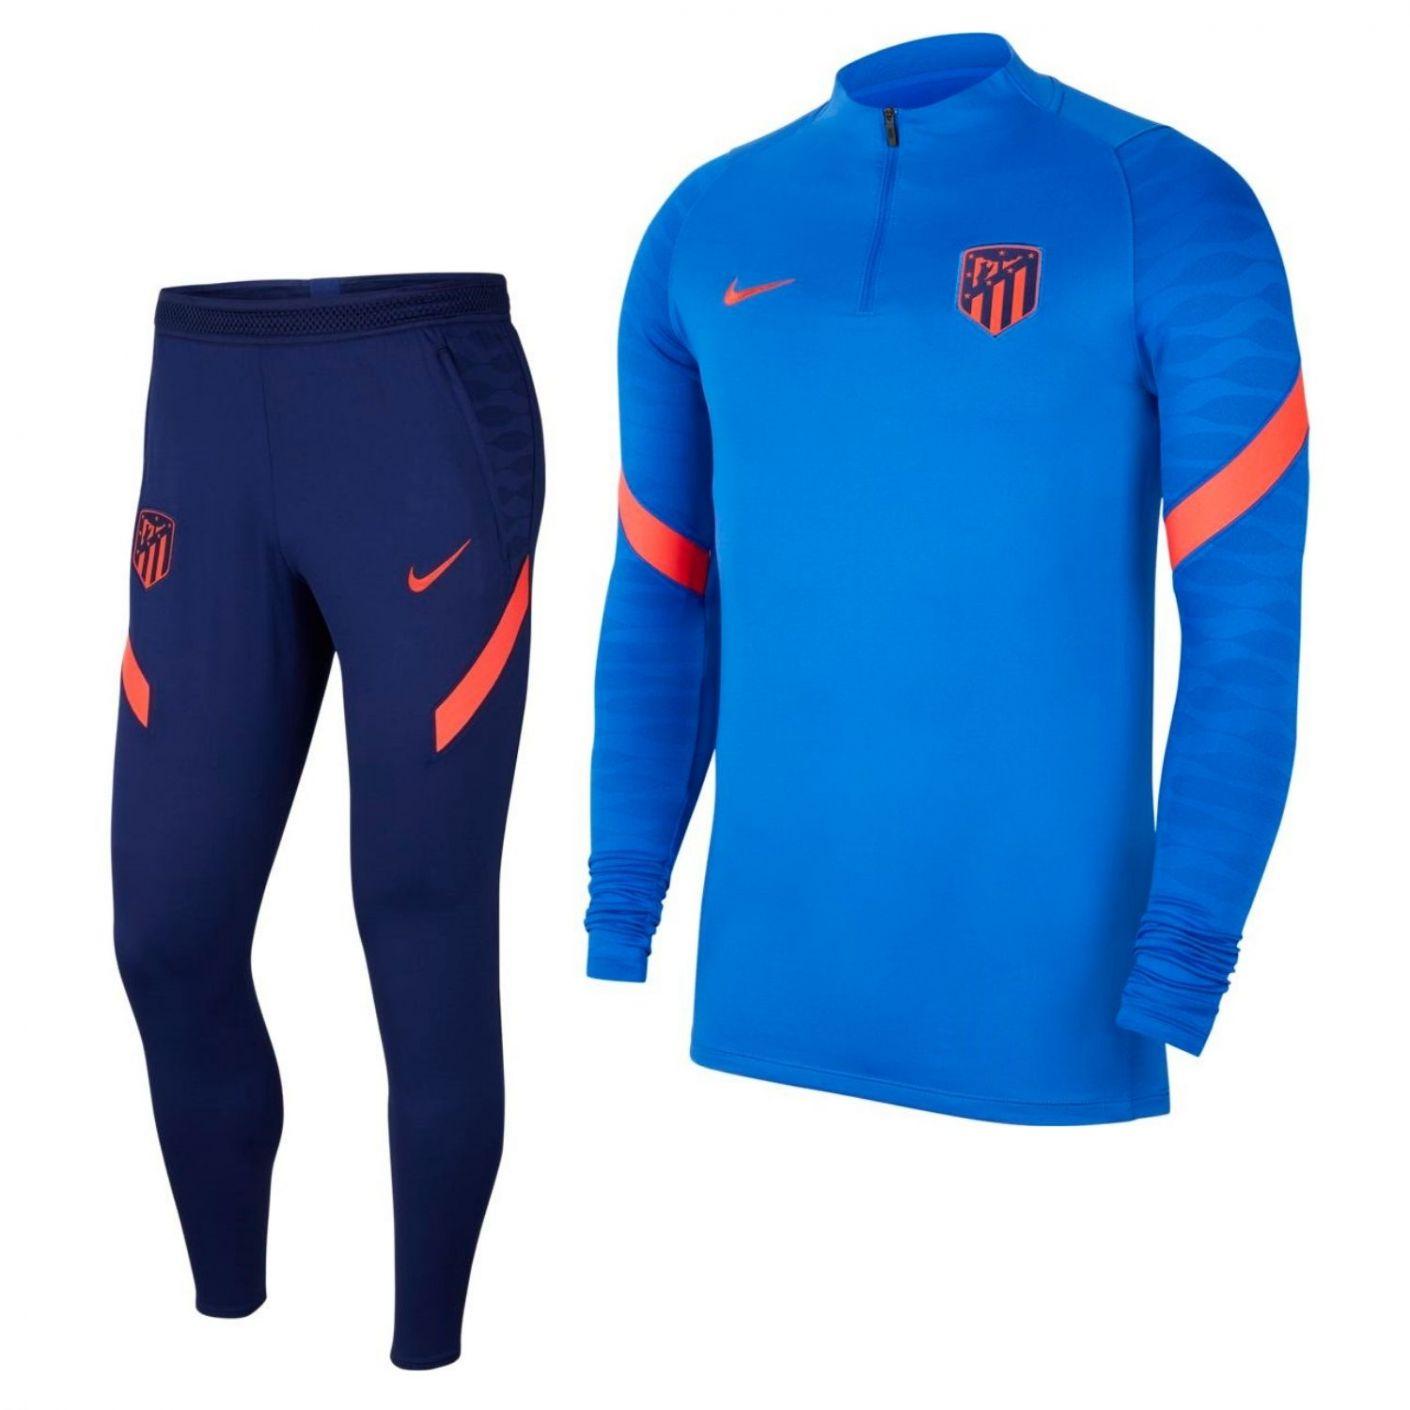 Nike Atletico Madrid Strike Drill Trainingspak 2021-2022 Blauw DonkerblauwNike Atletico Madrid Strike Drill Trainingspak 2021-20